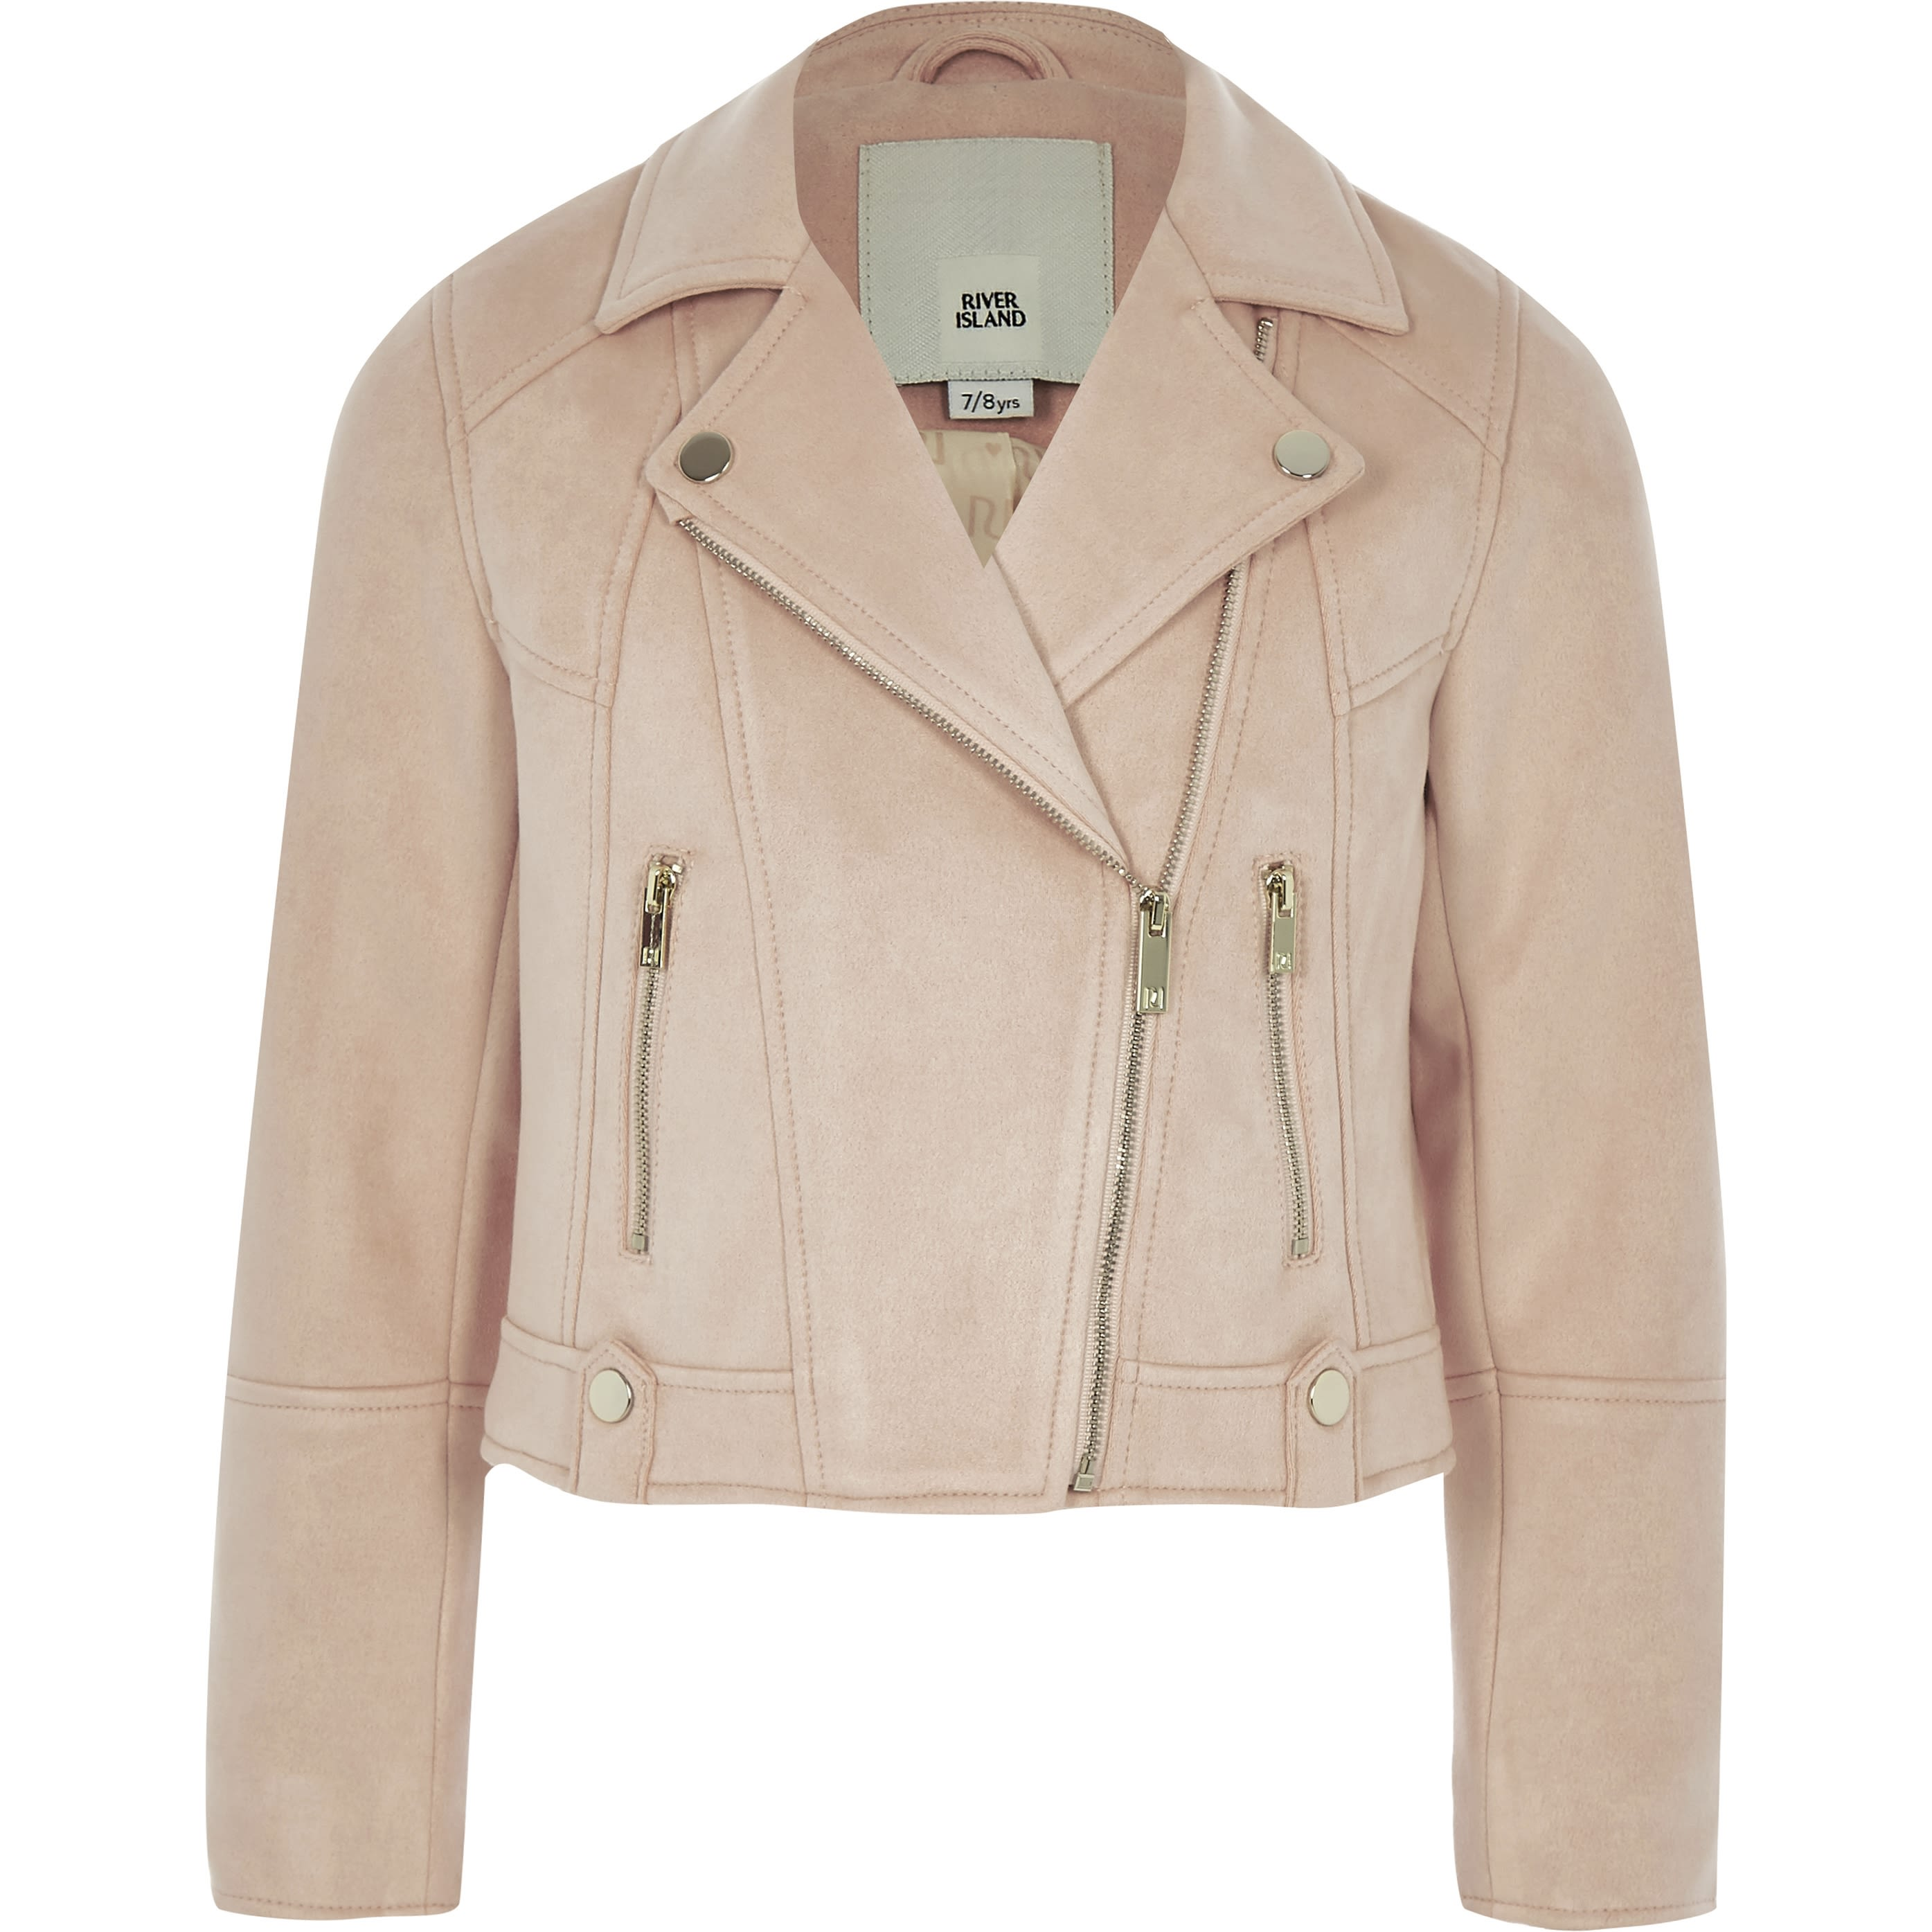 RIVER ISLAND   Girls Pink Faux Suede Biker Jacket   Goxip